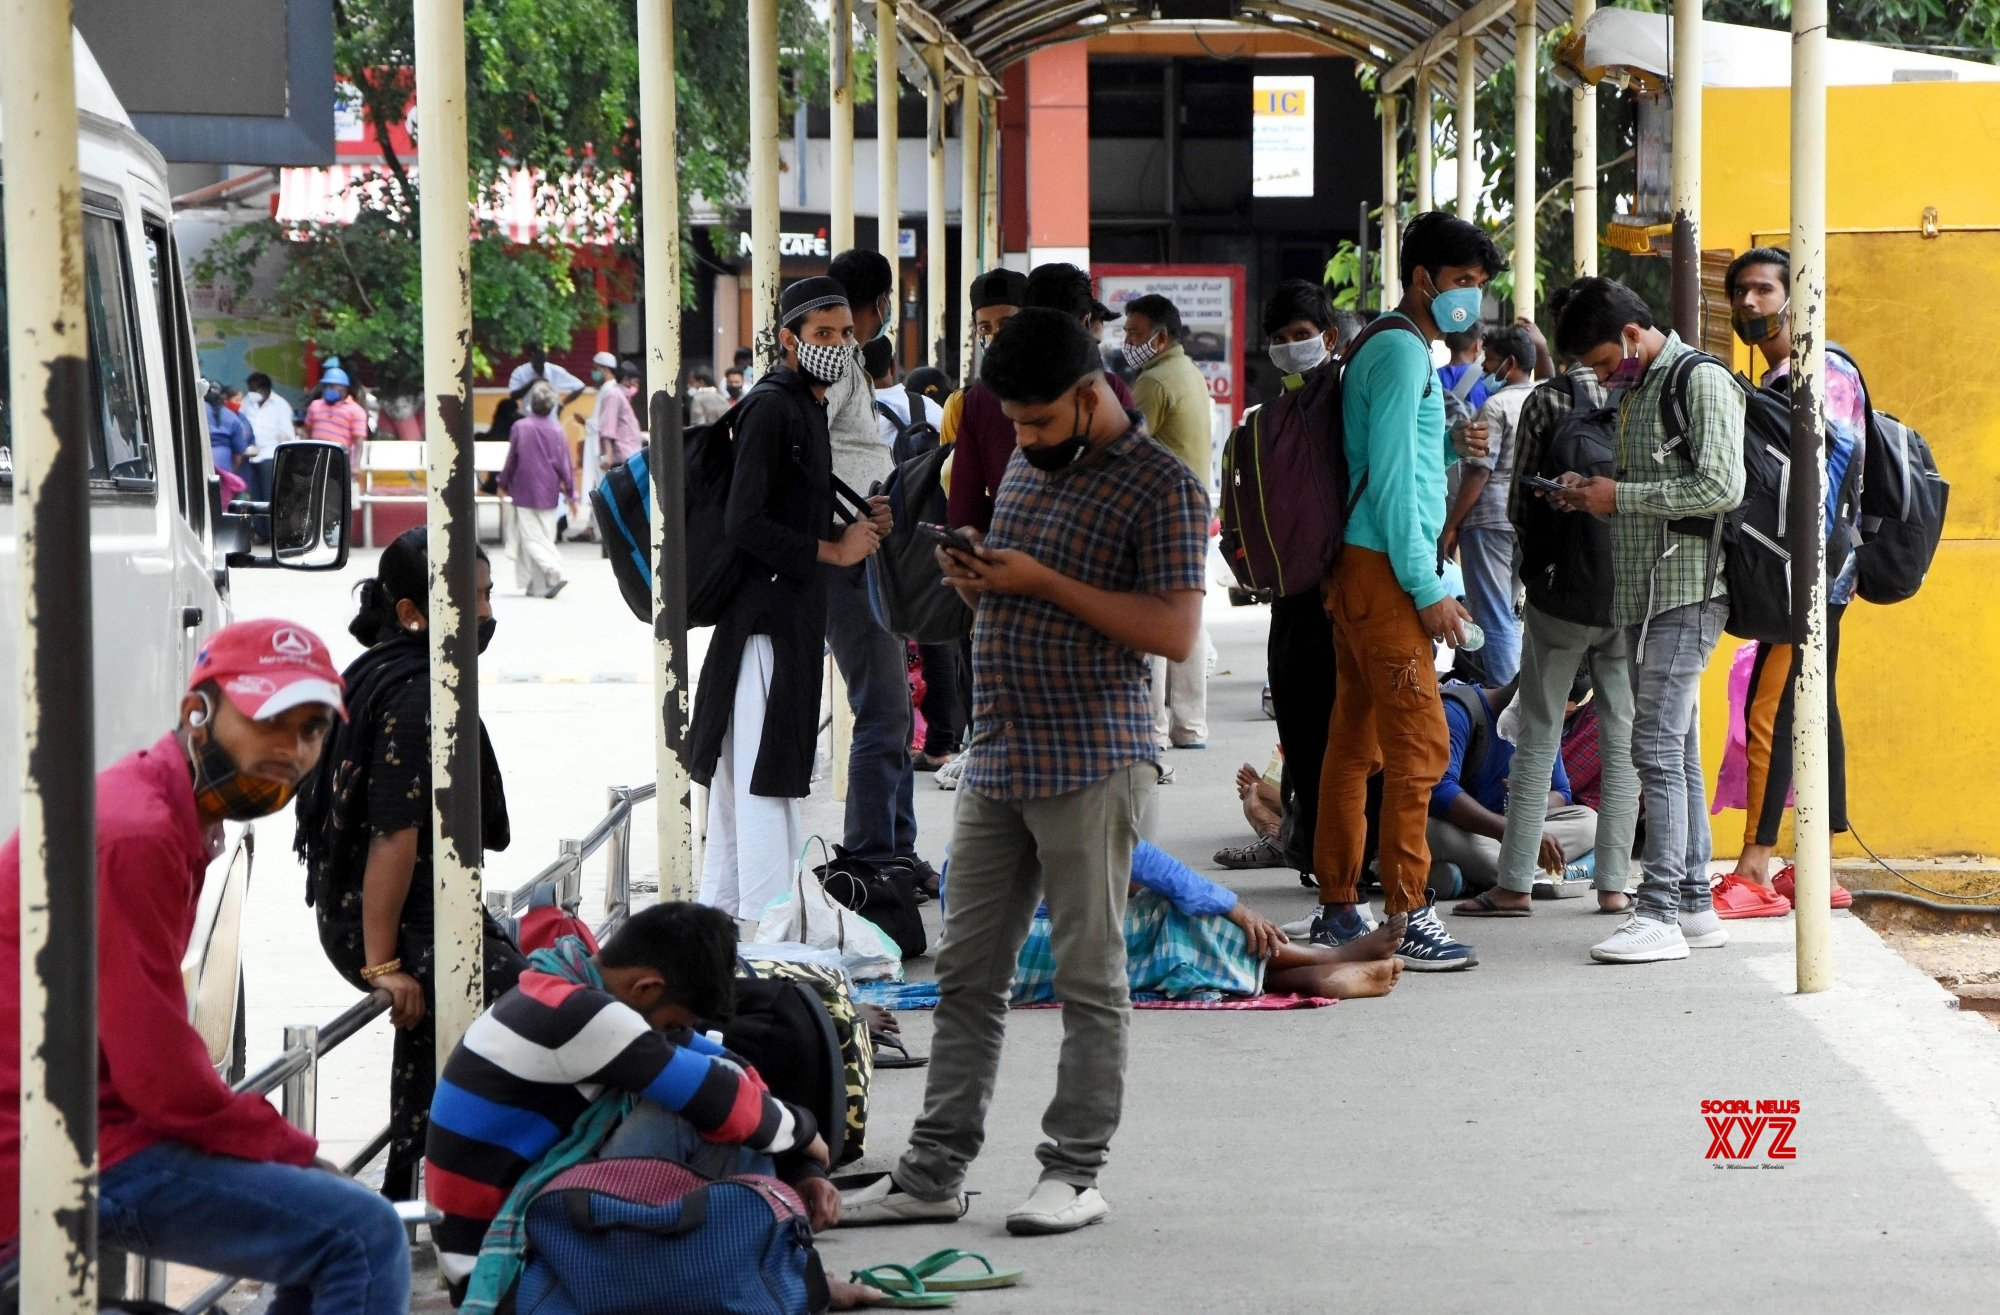 Bengaluru : Migrant workers with their belongings at Bengaluru City Railway station to travel to their native places during Coronavirus lockdown in Bengaluru. #Gallery